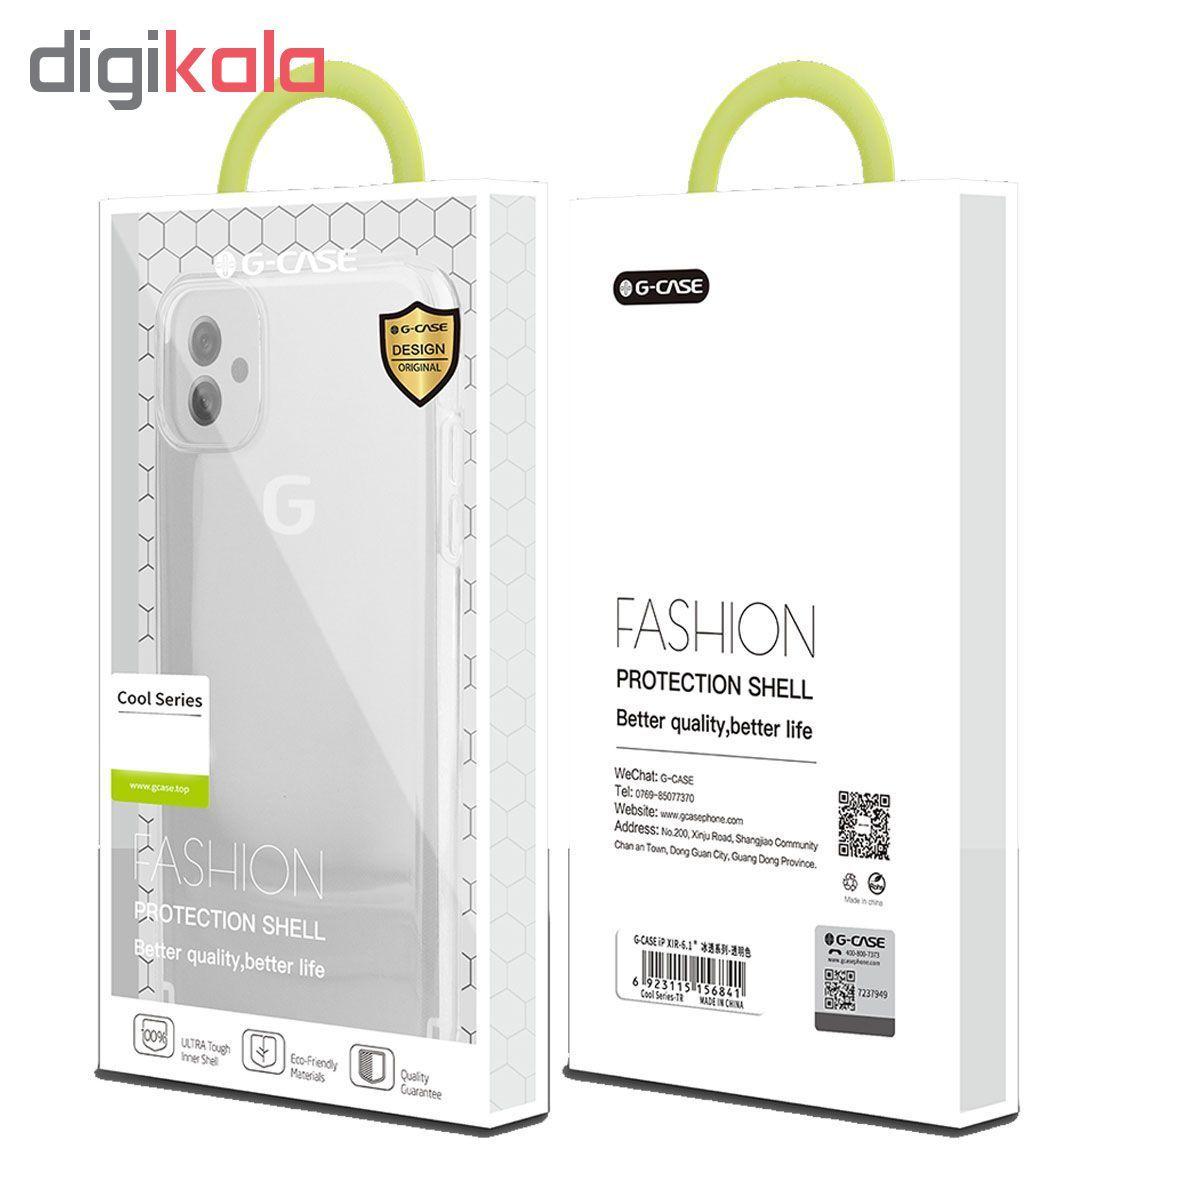 کاور جی-کیس مدل cool  مناسب برای گوشی موبایل اپل iphone 11 pro max main 1 4